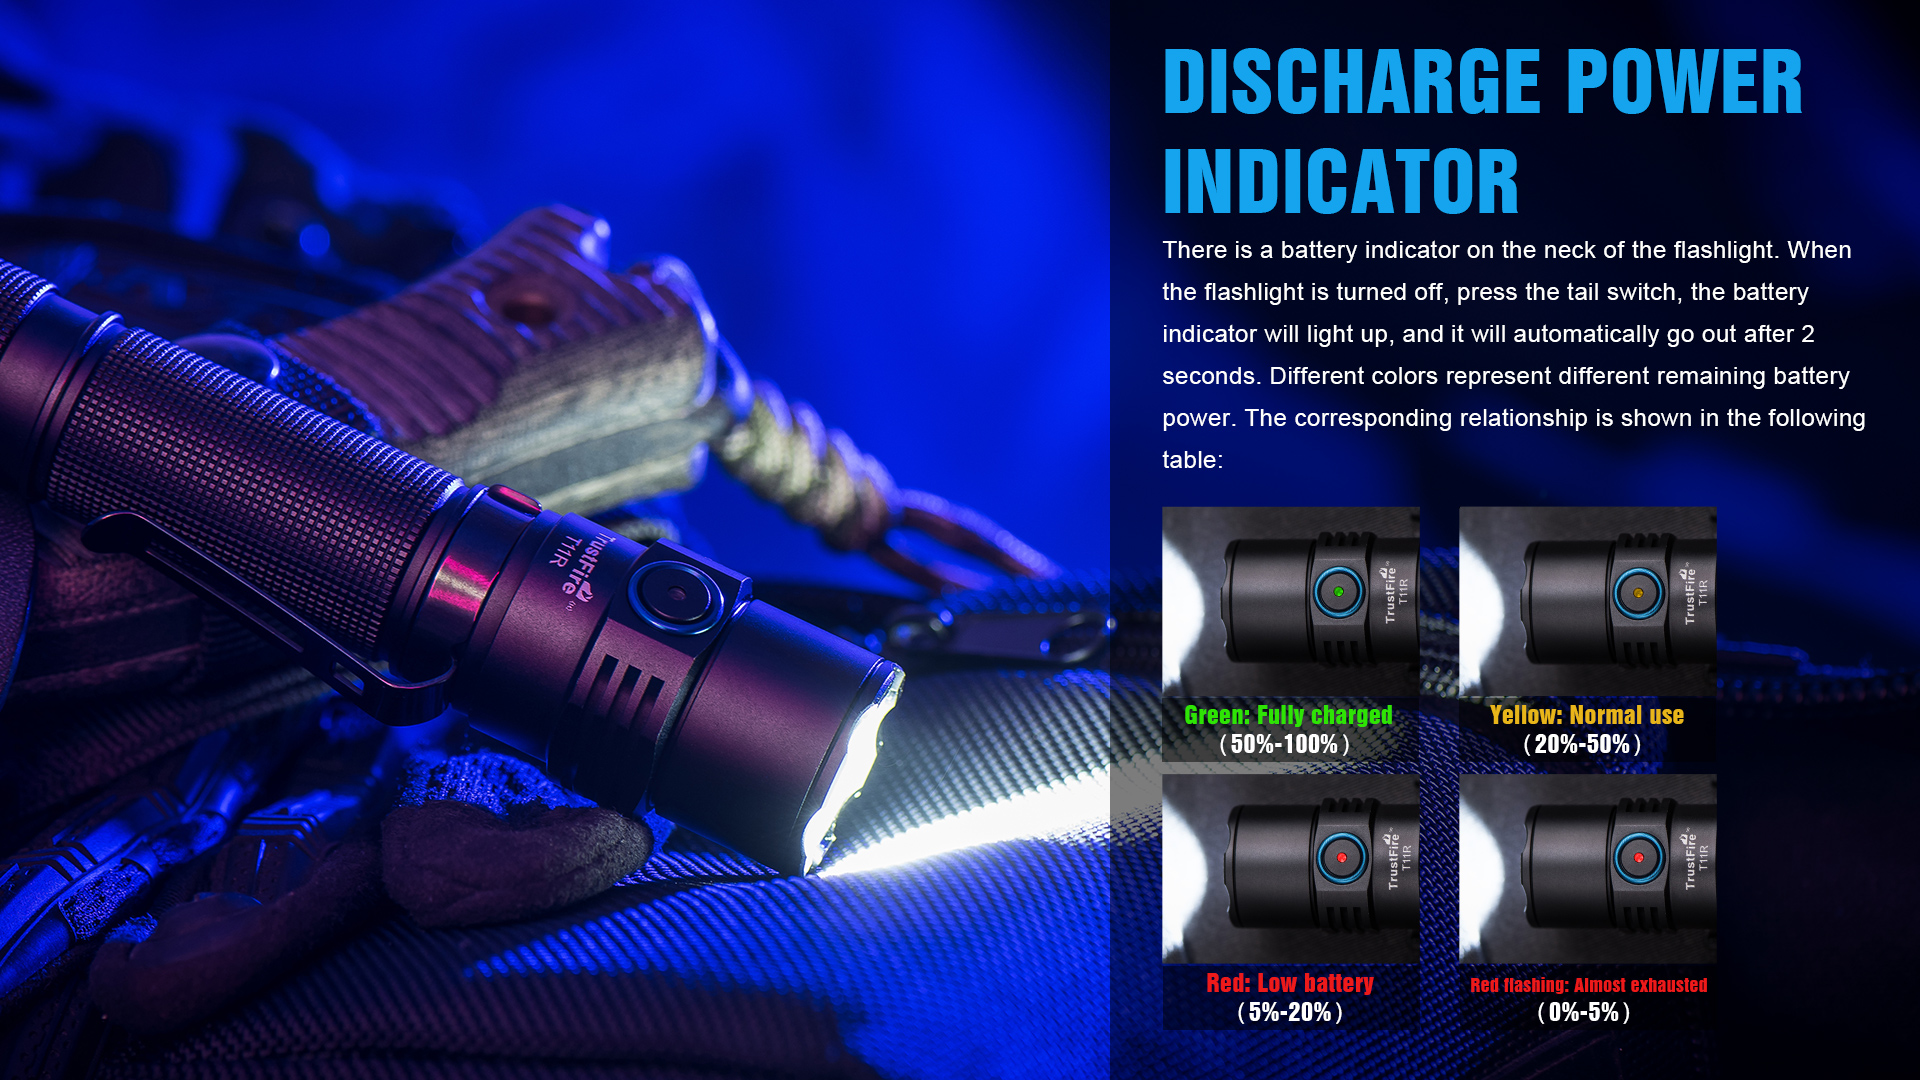 Trustfire-lanterna t11r, lanterna tocha tática 1800 lúmens